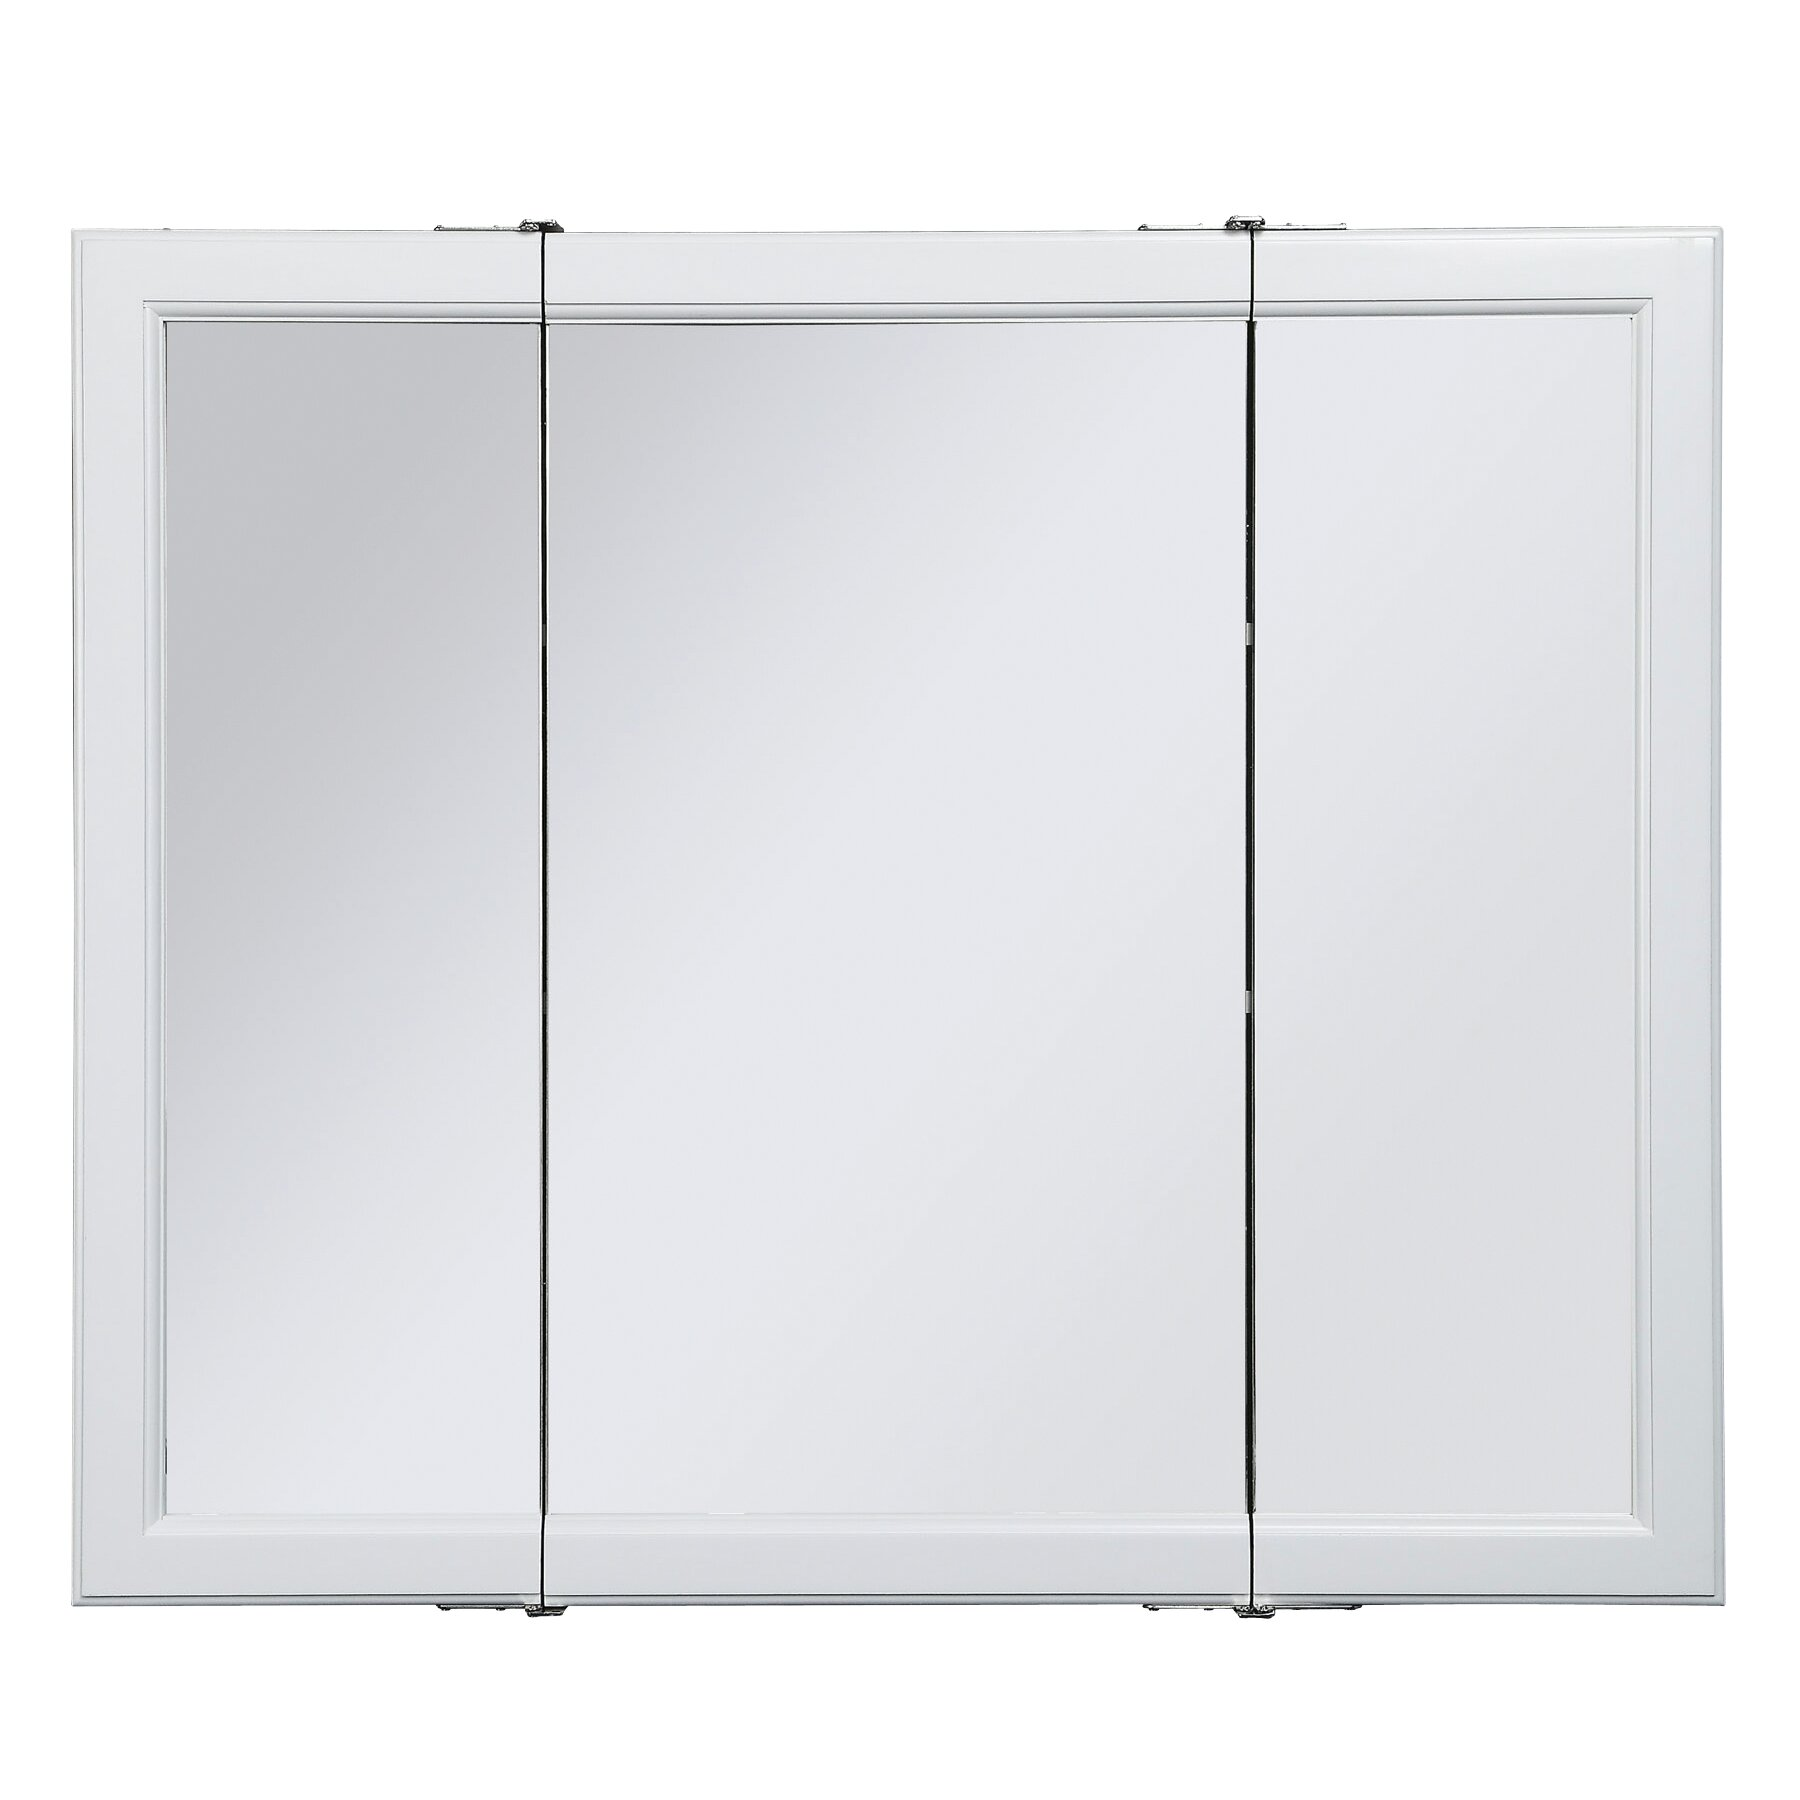 Design house wyndham 24 x 24 surface mount medicine for Kitchen cabinets 24x24